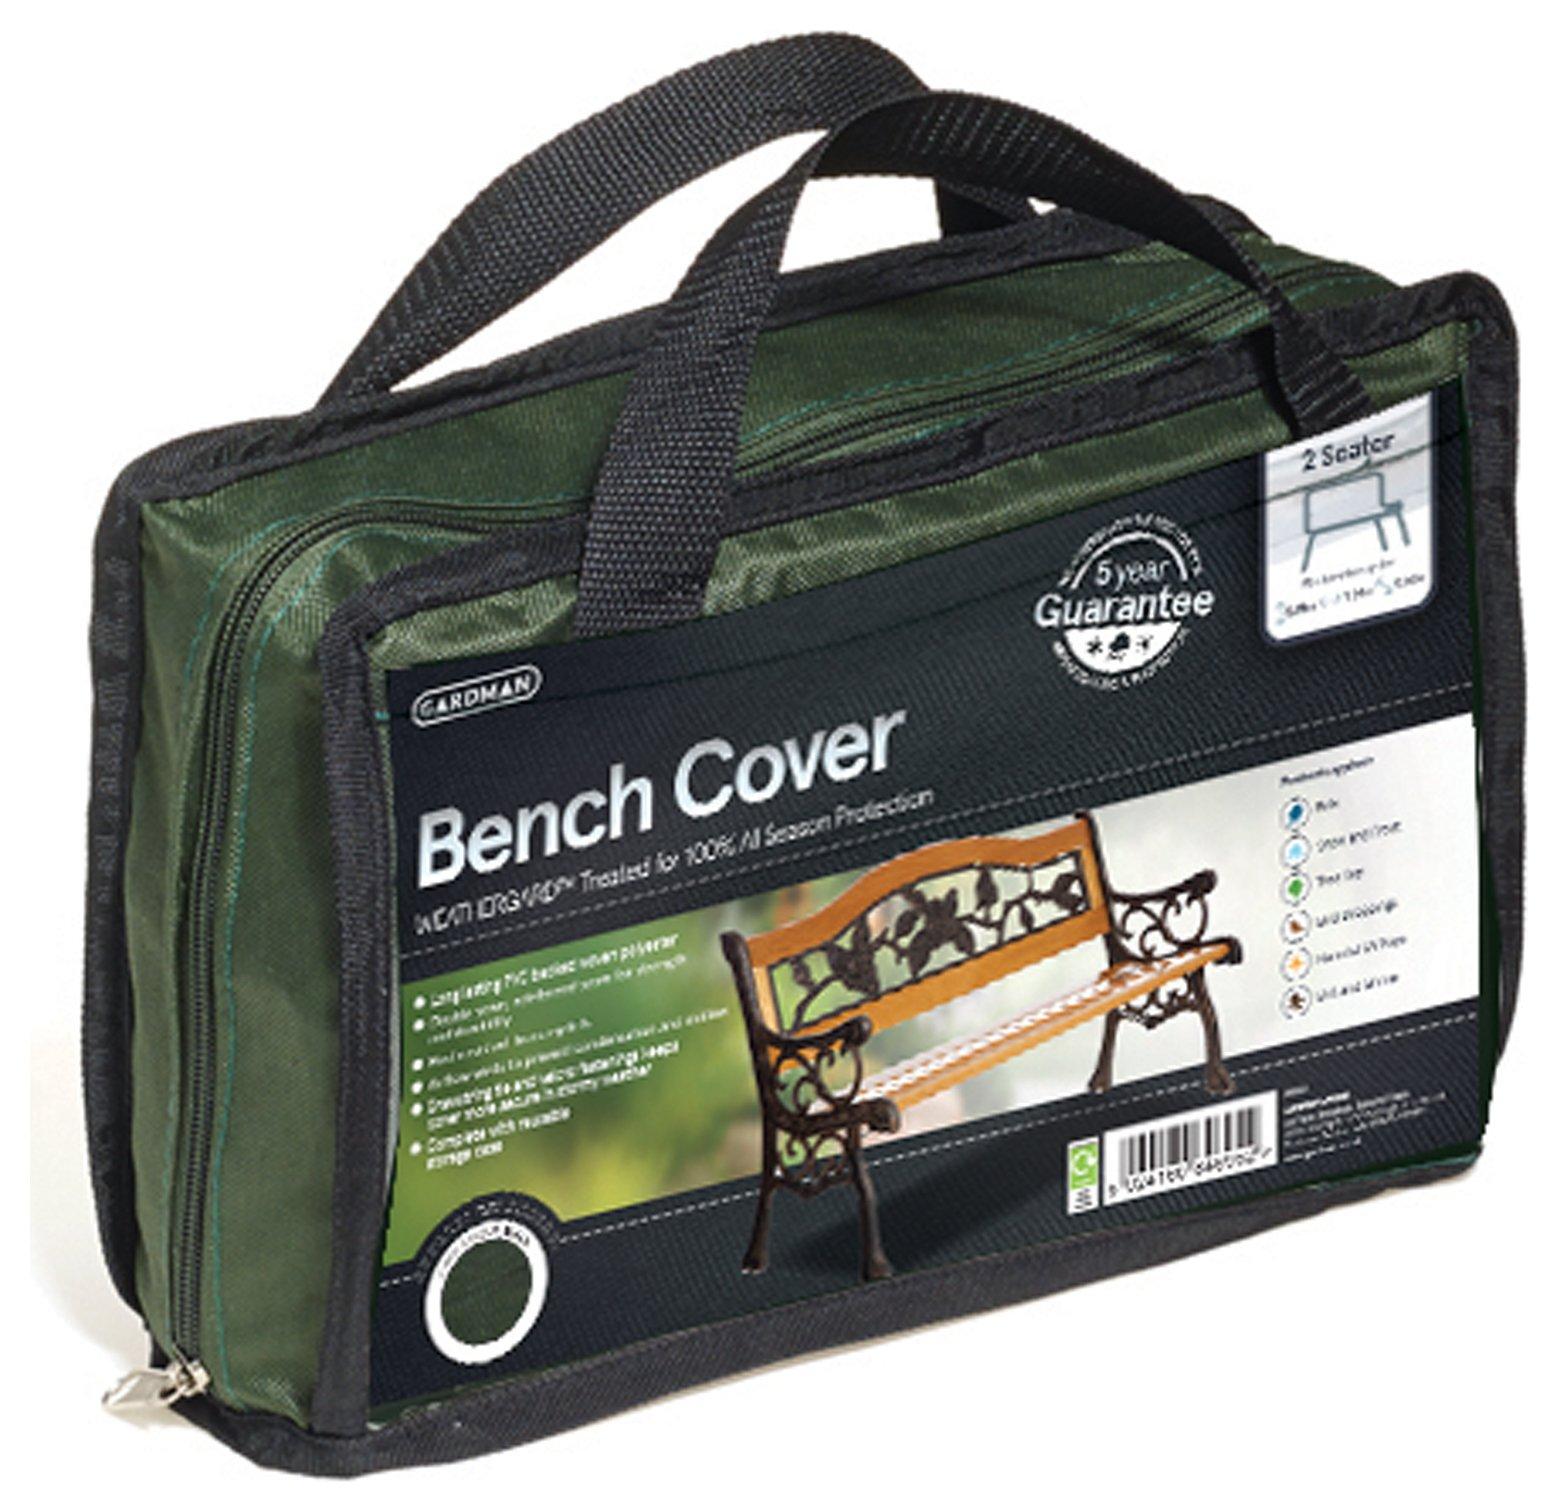 Gardman - 2 Seater Bench Cover - Green